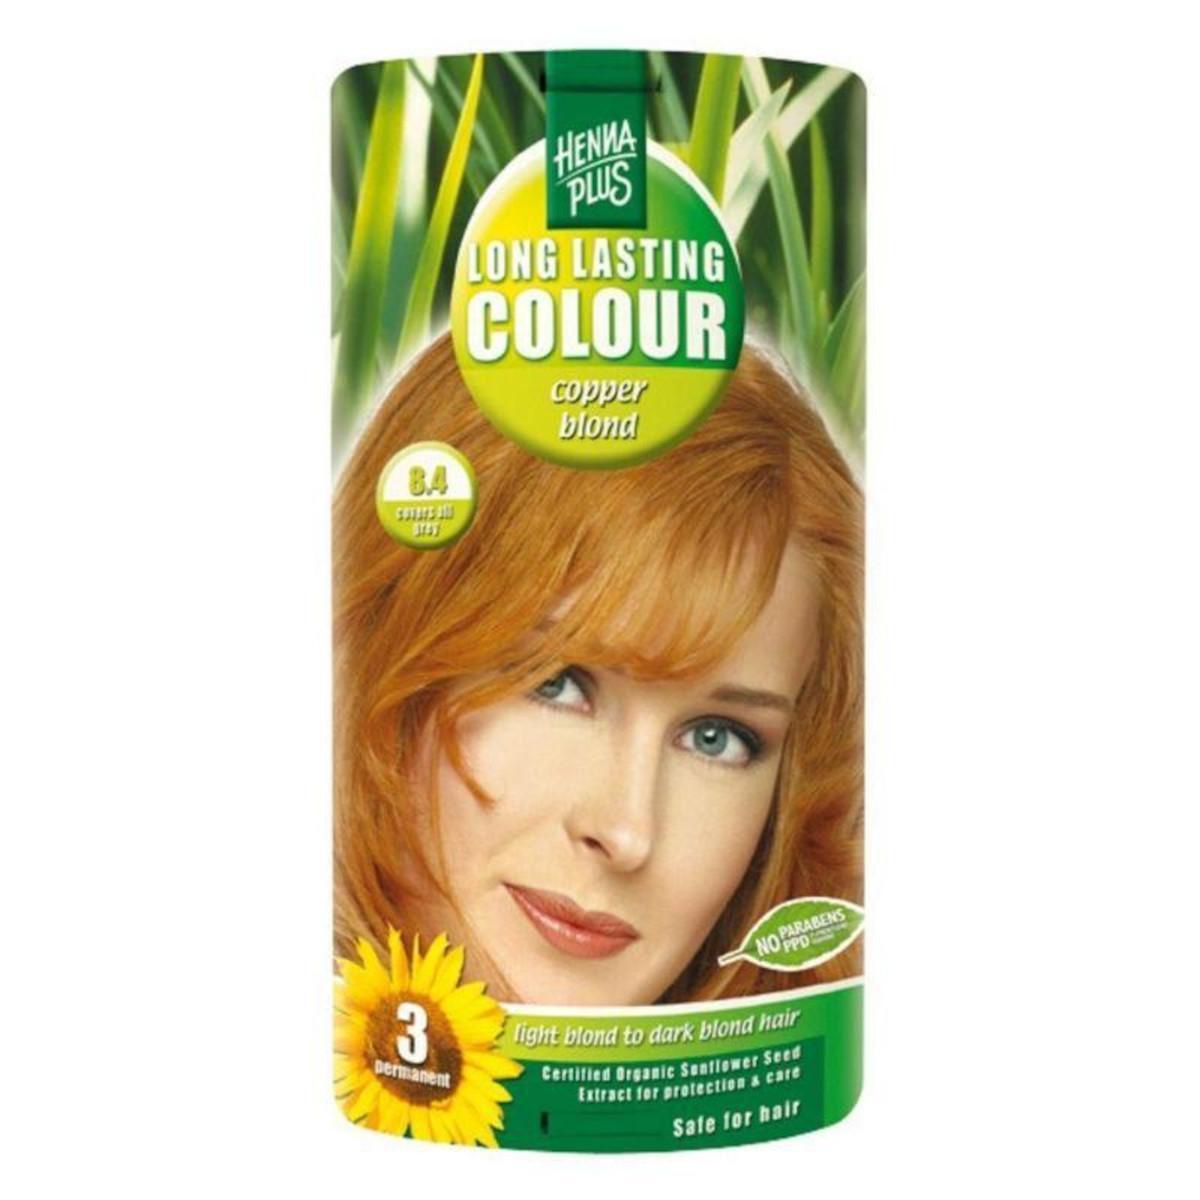 Biooo Cz Henna Plus Dlouhotrvajici Barva Medena Blond 8 4 100 Ml